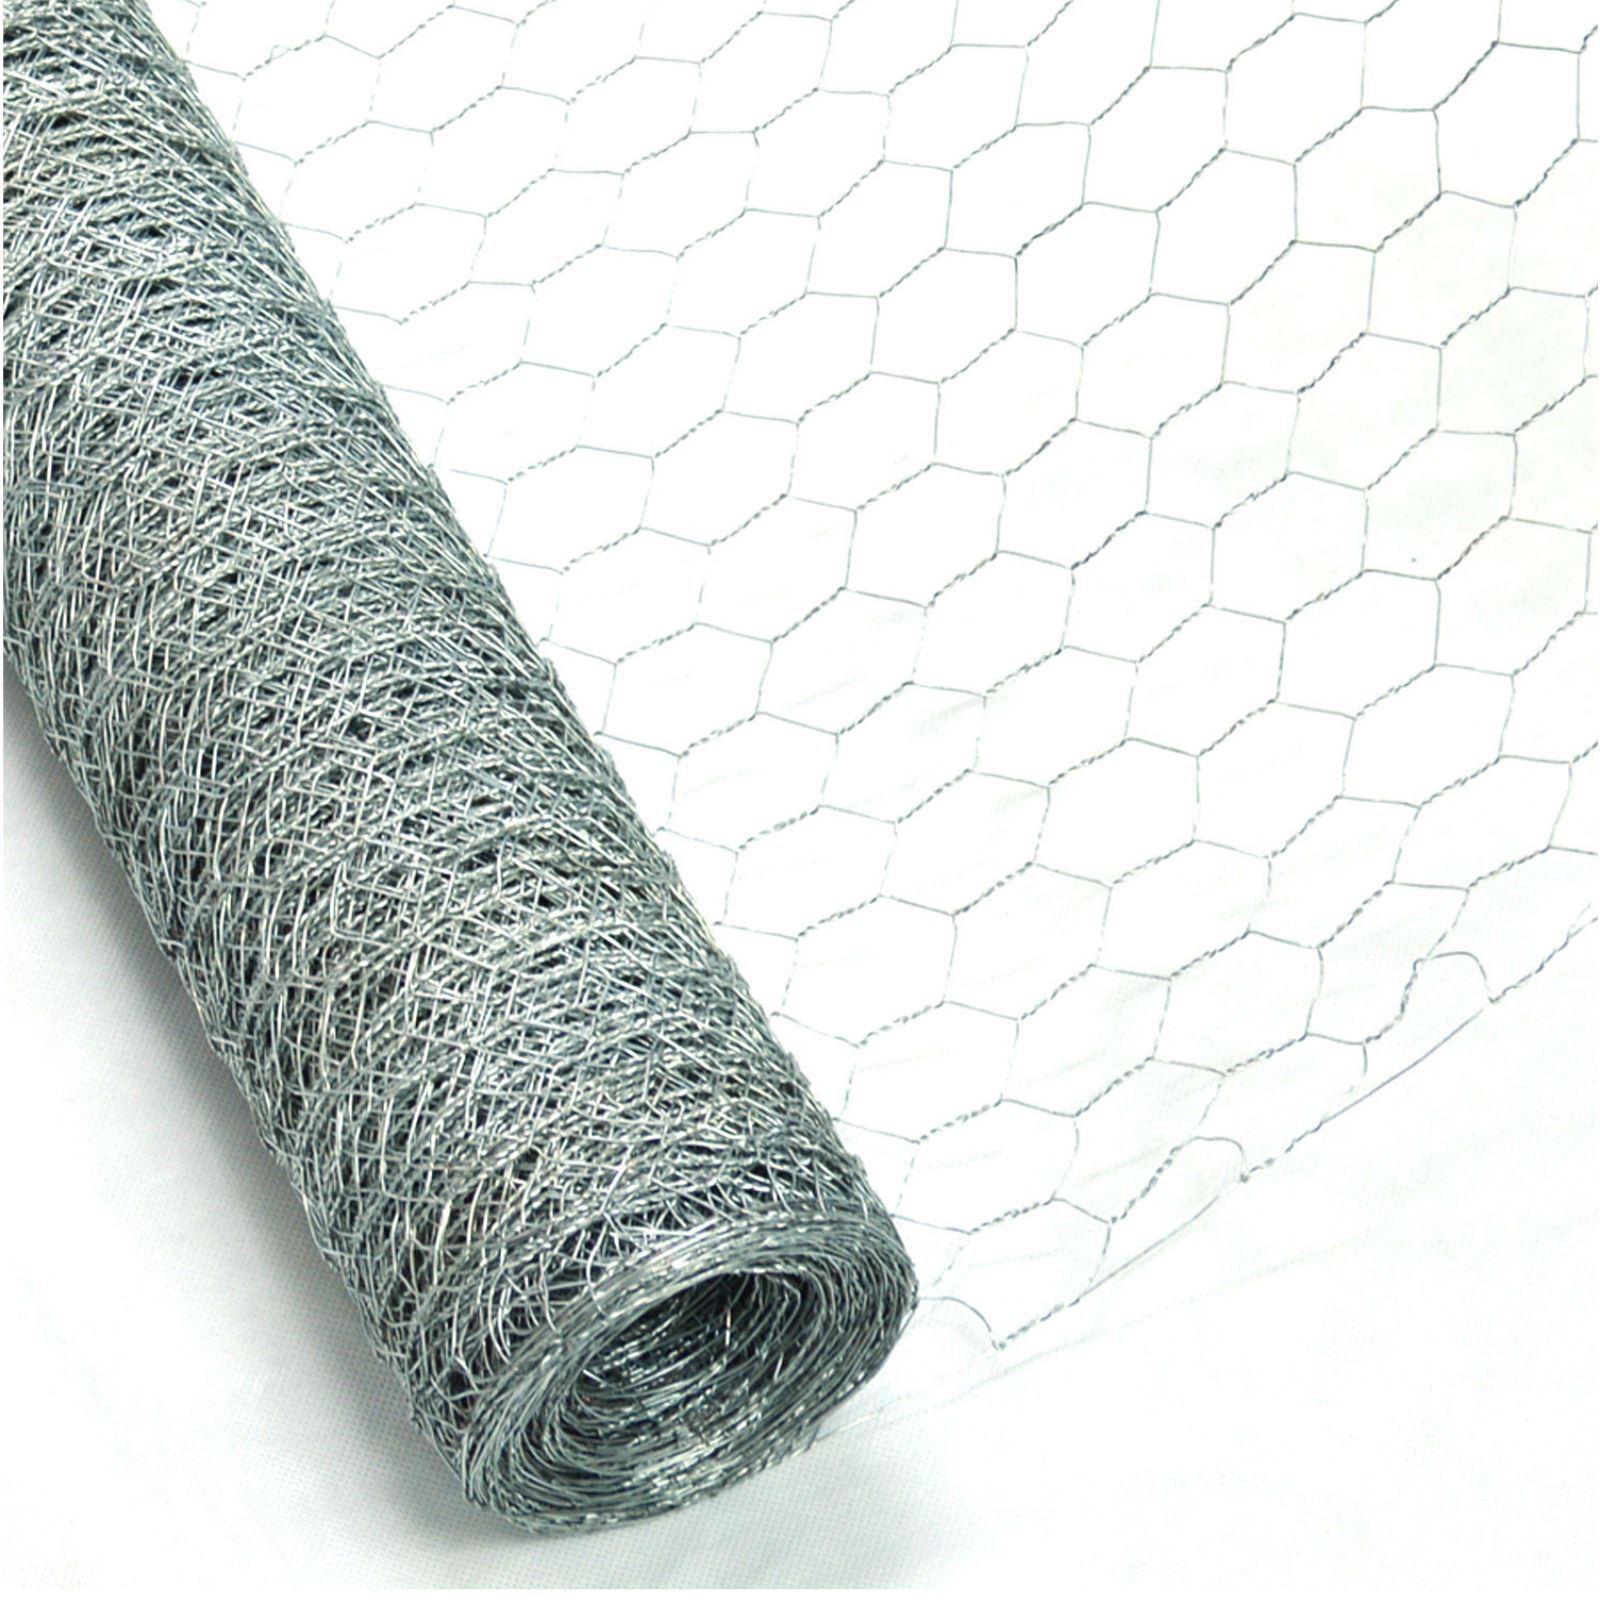 6m x 0.9m Galvanised Chicken Rabbit Wire Mesh Roll Woven Metal Fence ...